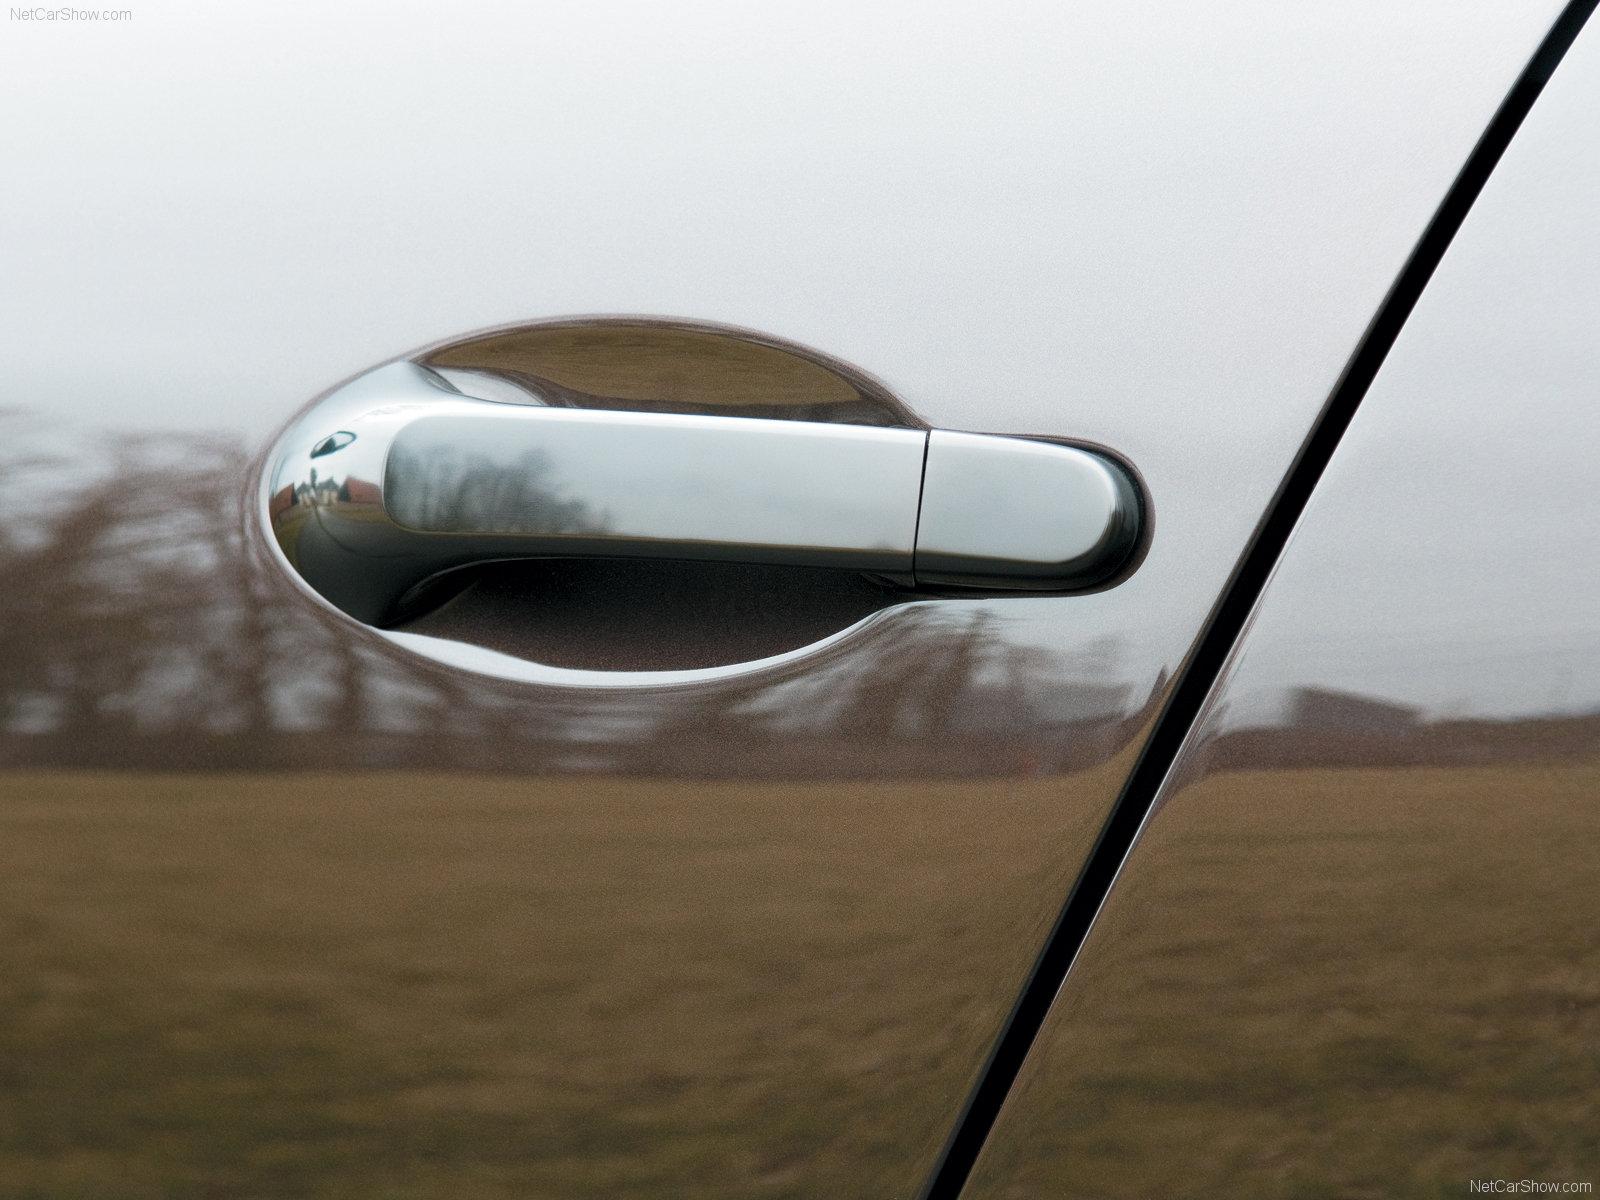 2008%2BBugatti%2BVeyron%2BFbg%2Bpar%2BHermes%2B%252817%2529 Inspiring Bugatti Veyron Price Australian Dollars Cars Trend